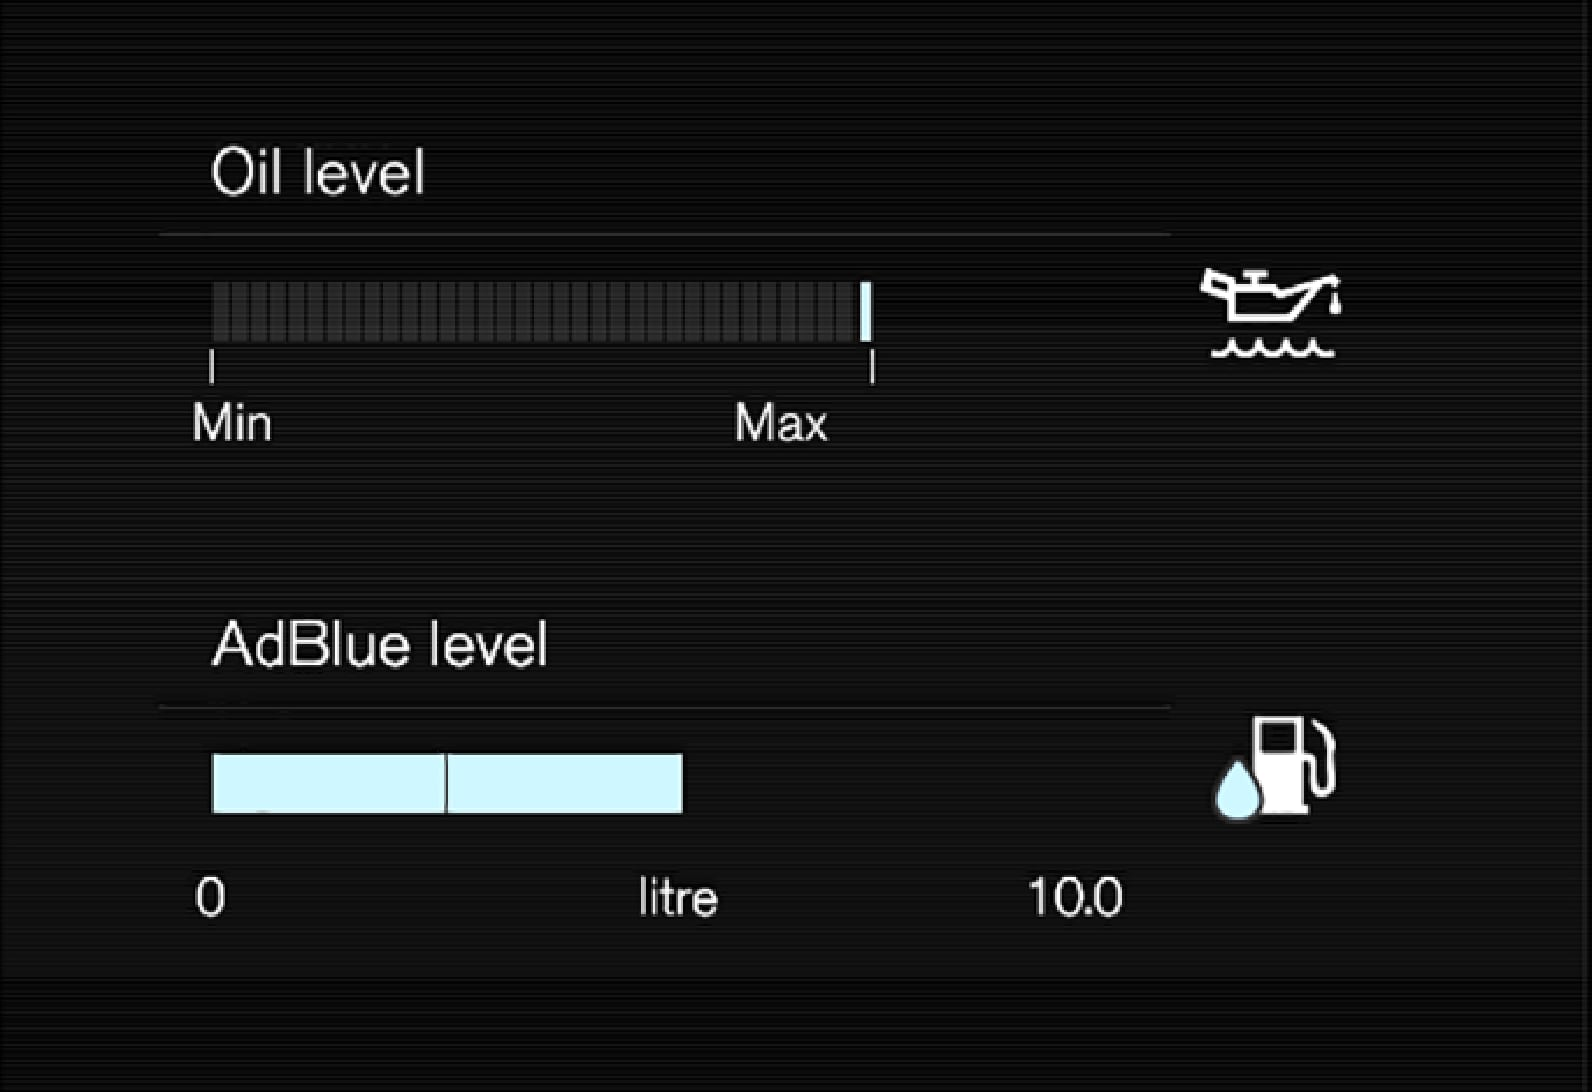 18w09 - Supportsite - Graphic for AdBlue level centerdisplay